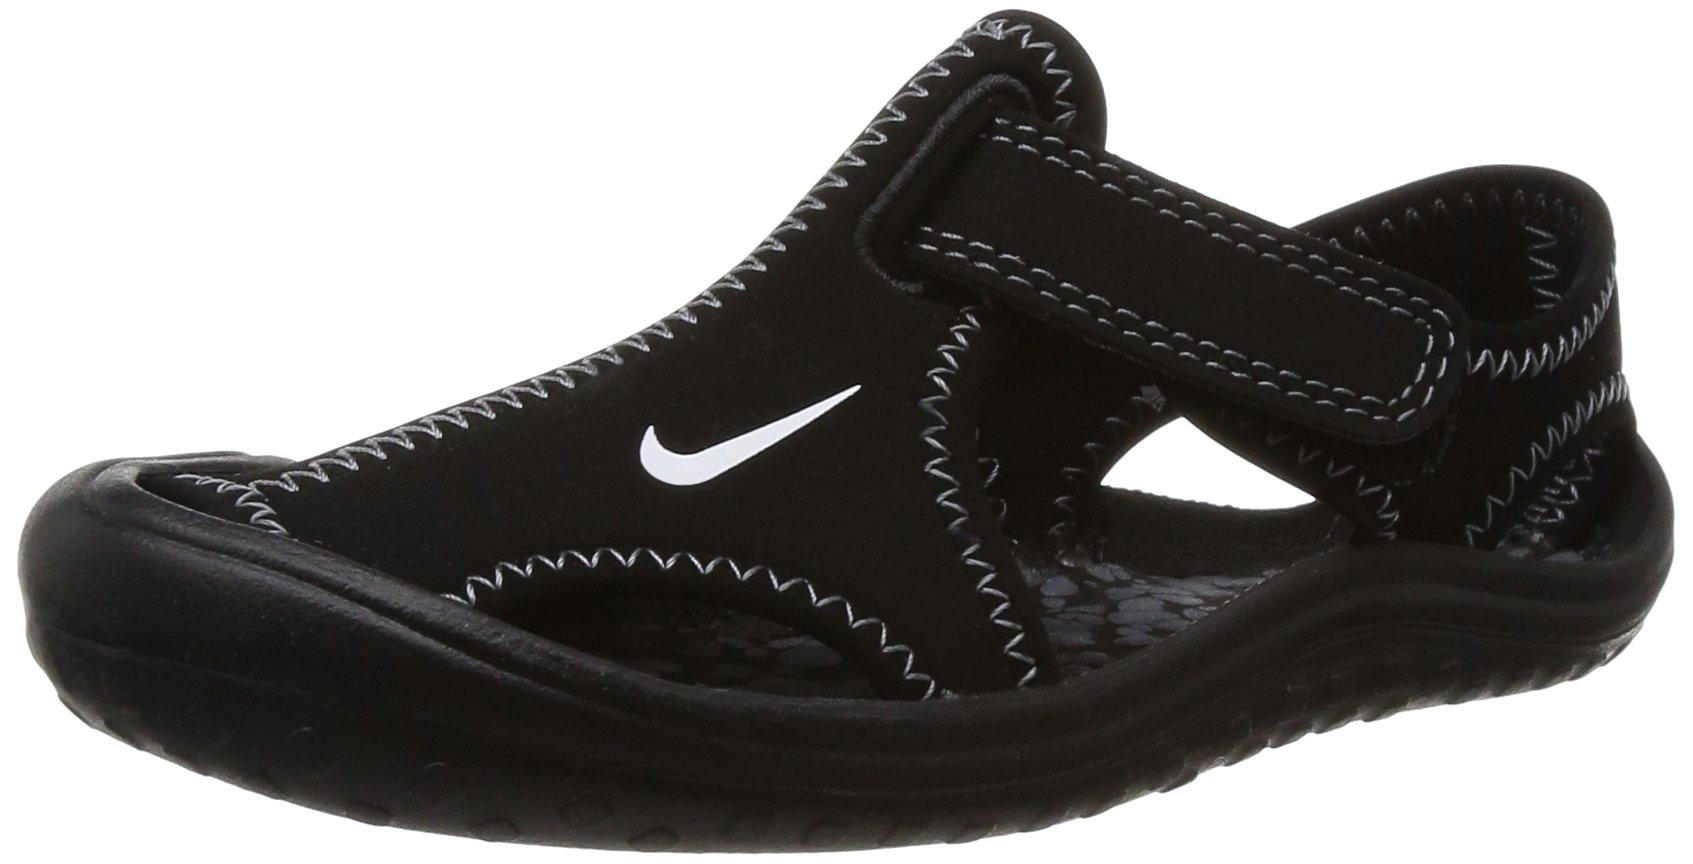 New Nike Boy's Sunray Protect Sandal Black/White 2 by NIKE